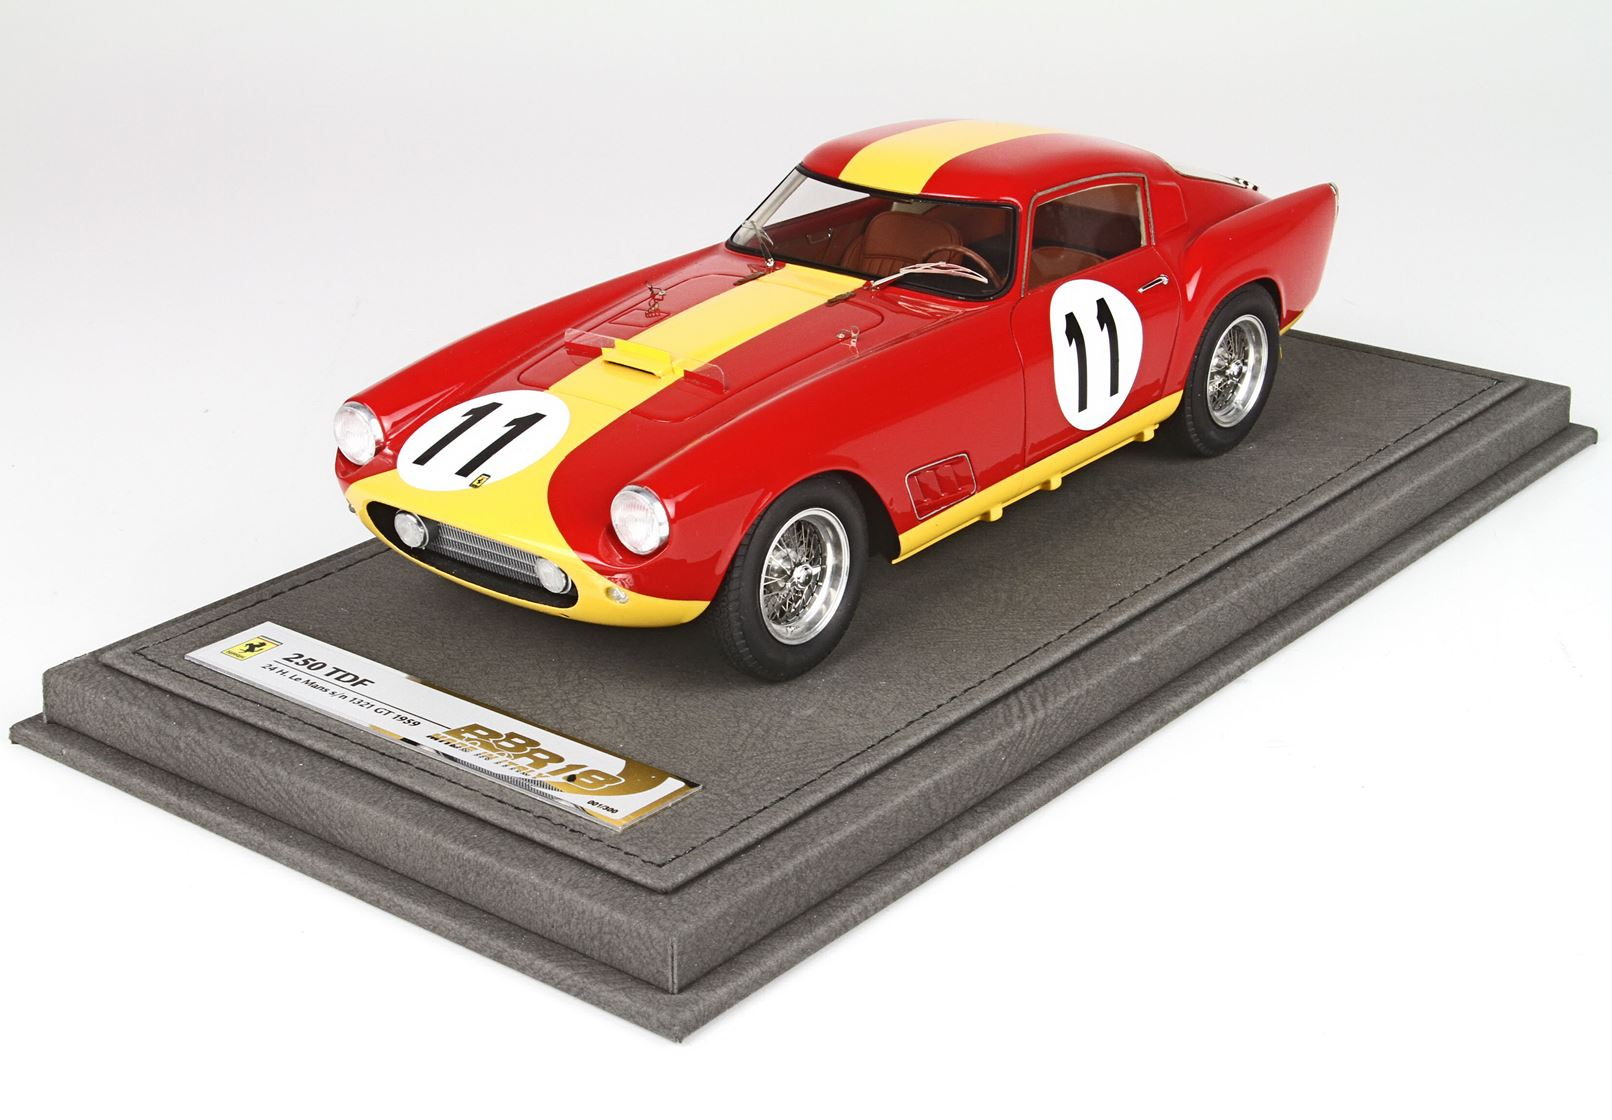 Ferrari 250 TDF 24H Le Mans 1959 S/N 1321 GT Car #11 Ltd 300 Pcs With Case 1/18